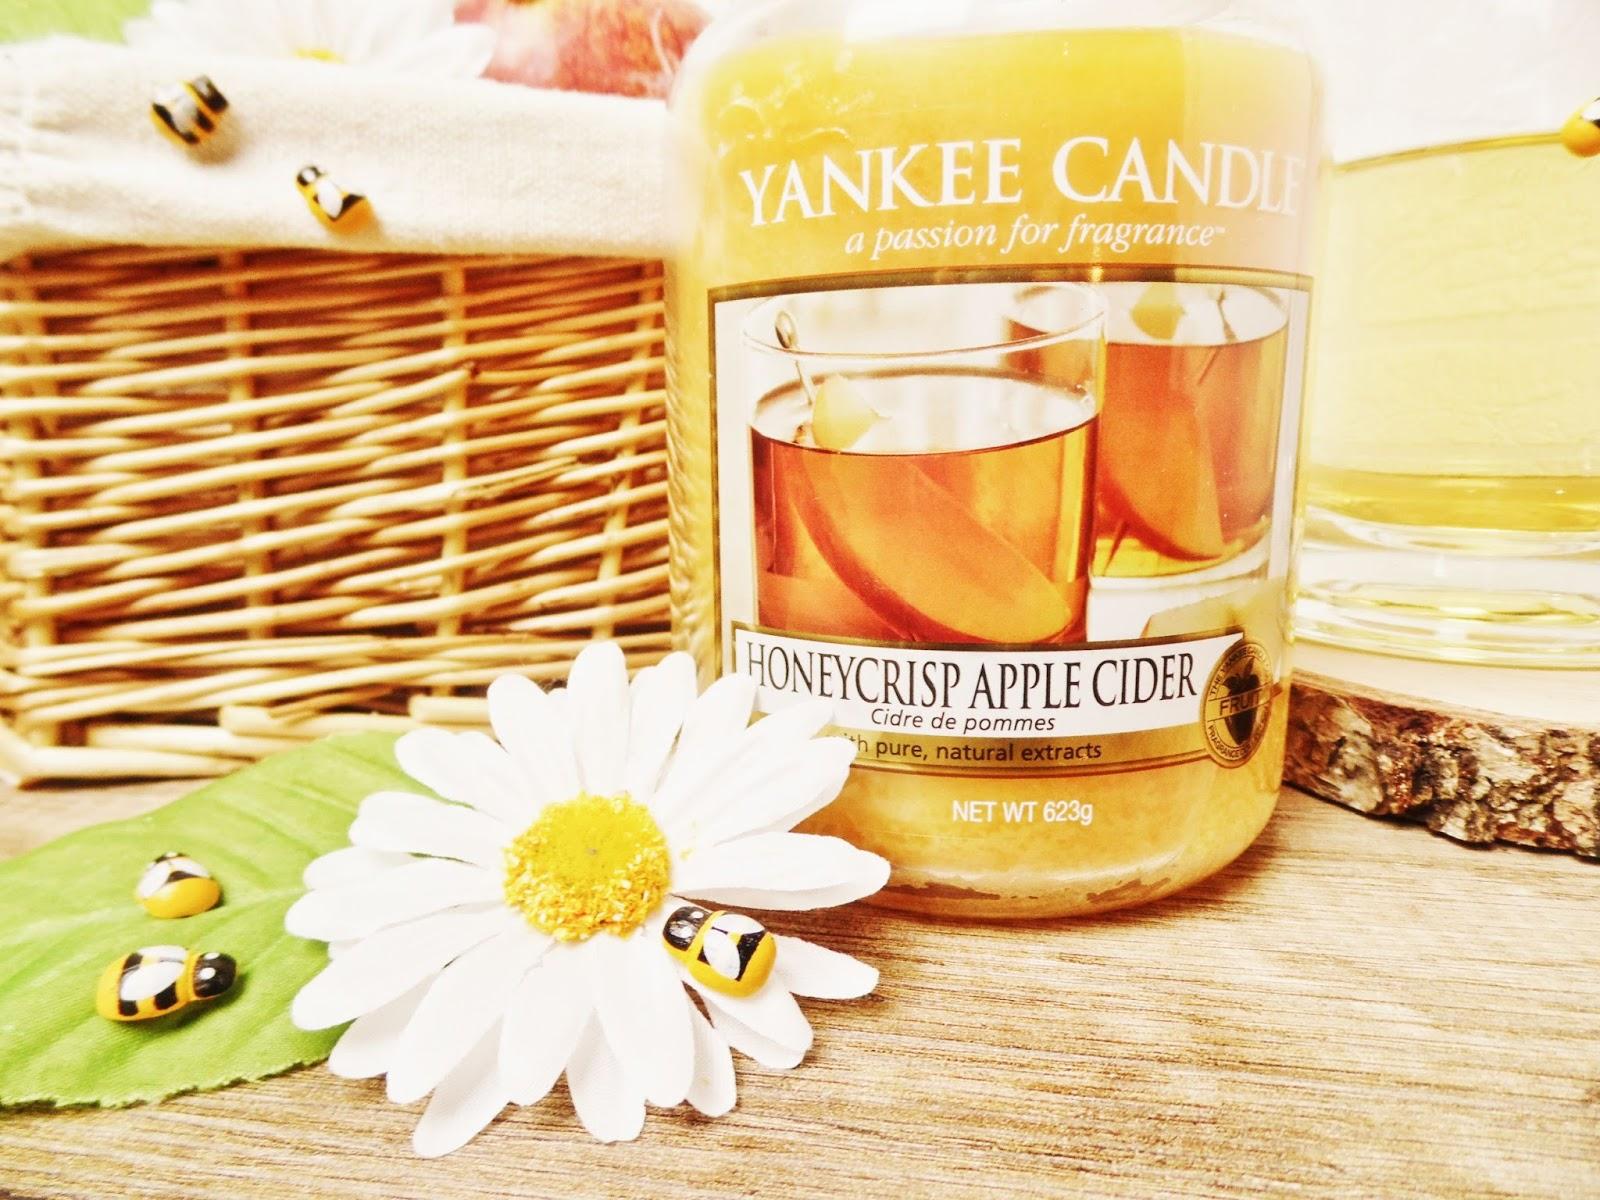 Honeycrisp Apple Cider Yankee Candle